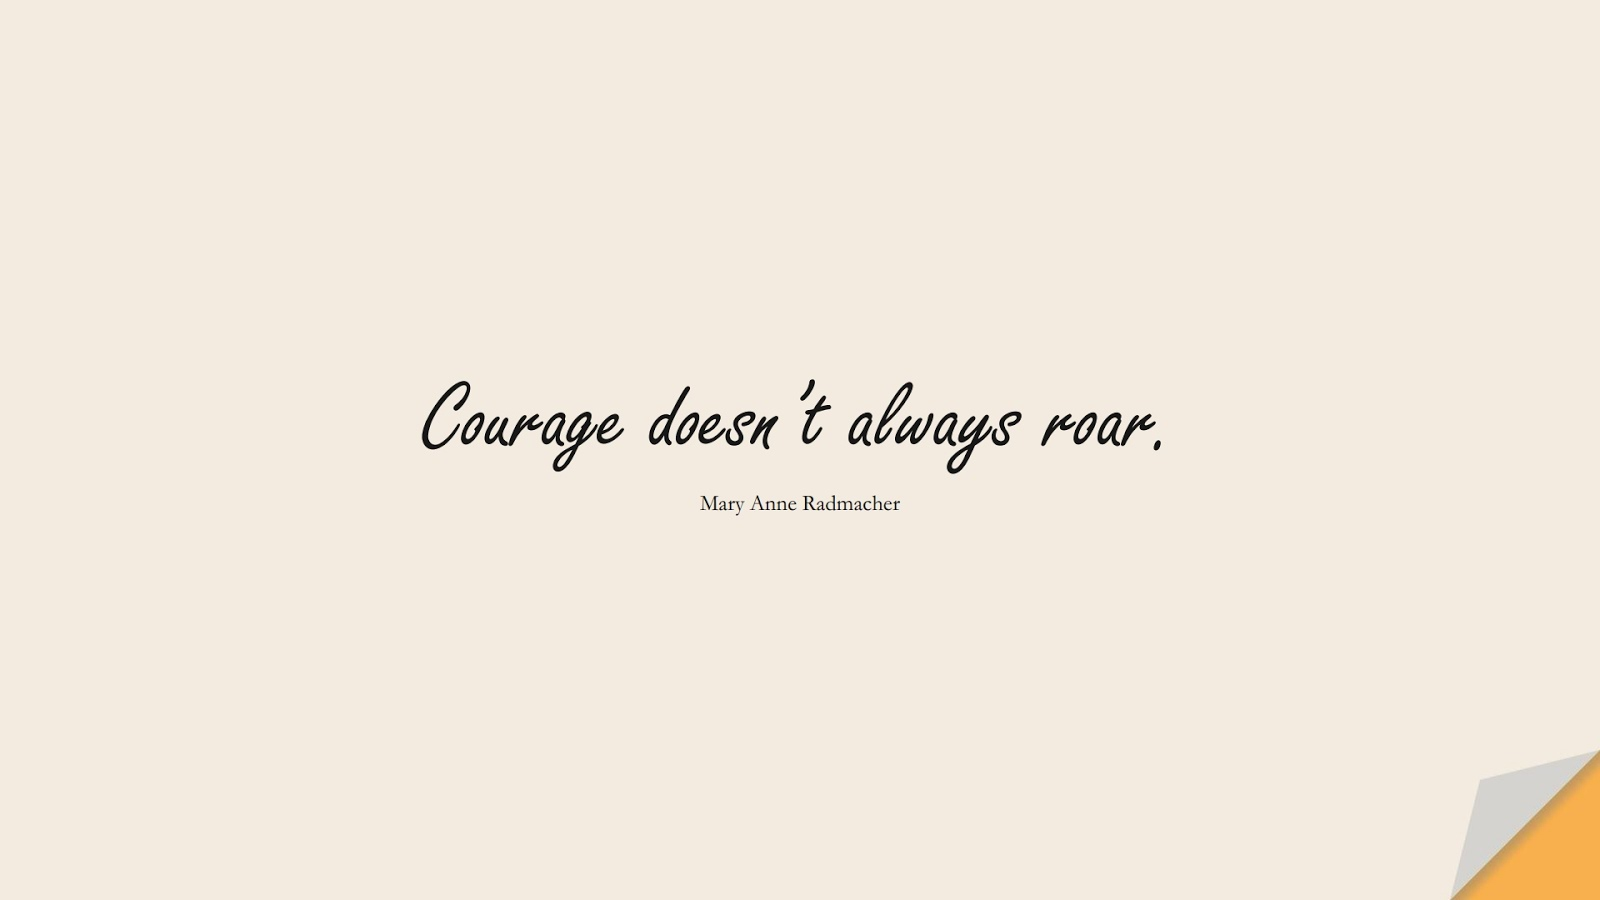 Courage doesn't always roar. (Mary Anne Radmacher);  #ShortQuotes